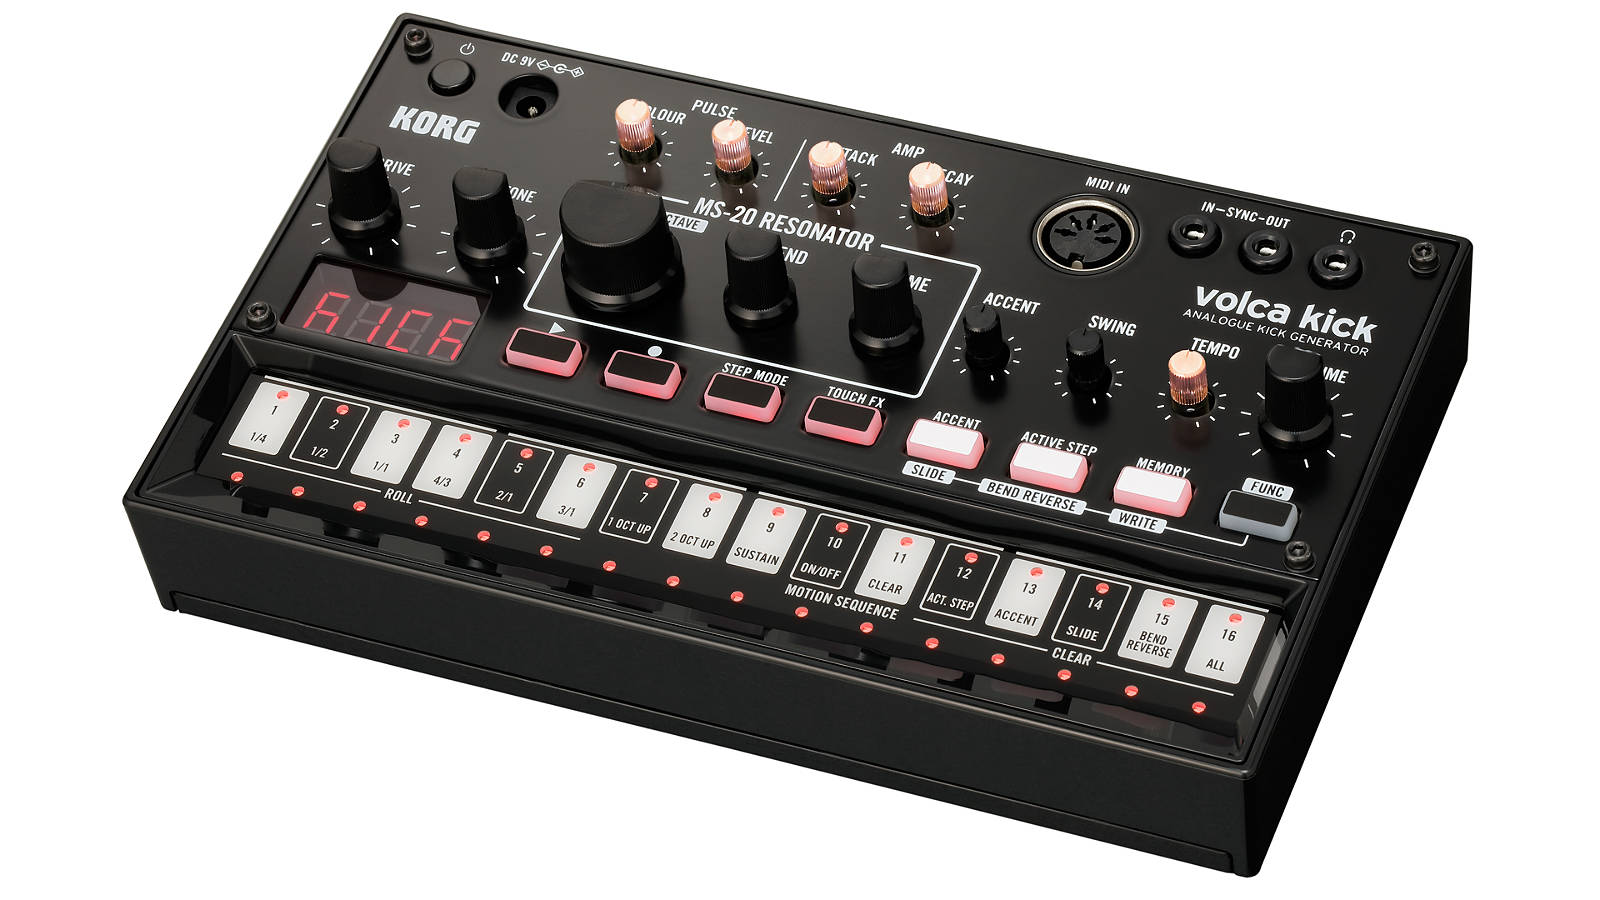 KORG volca kick analoger Synthesizer